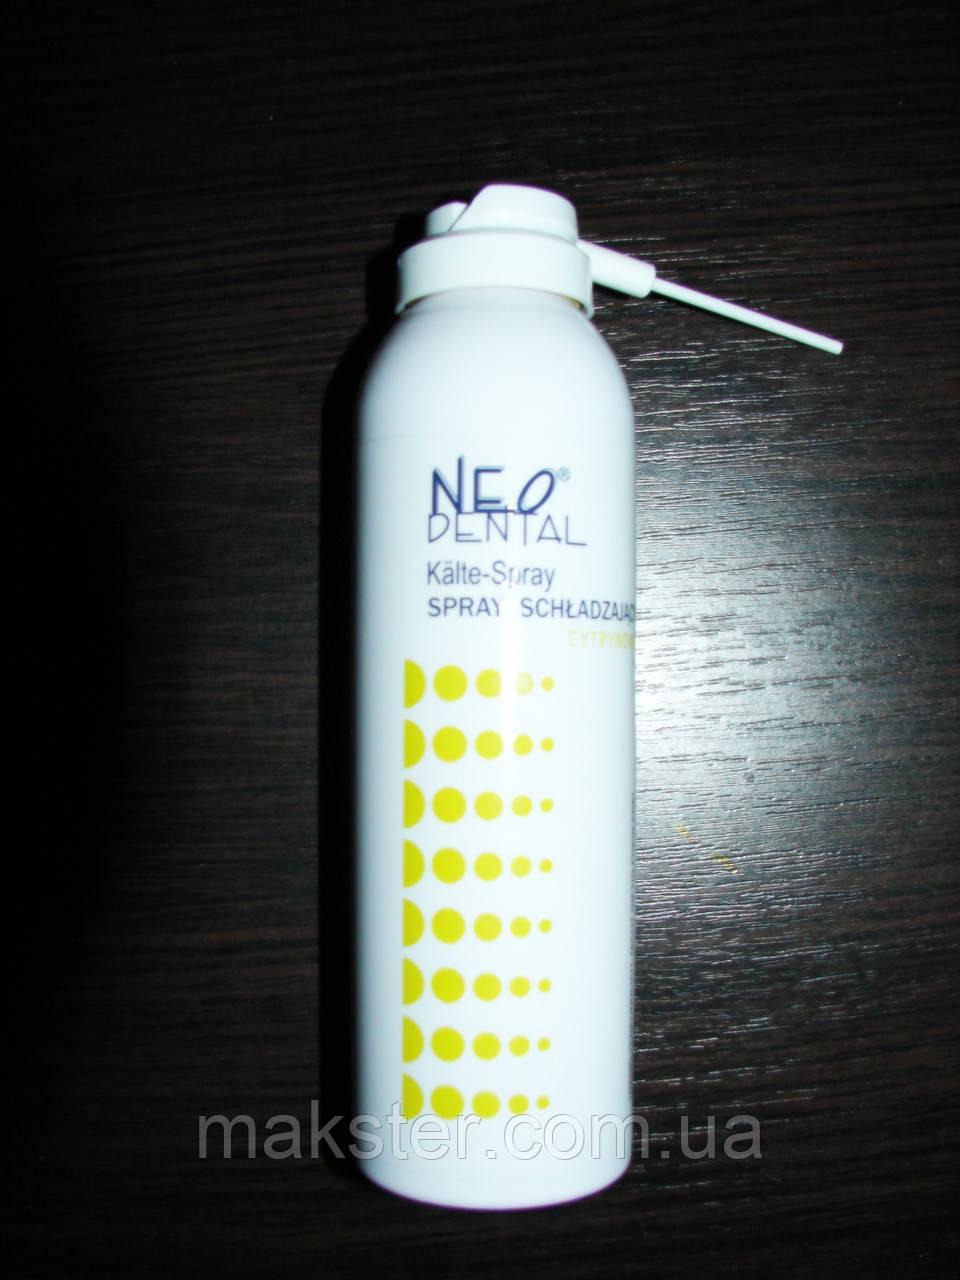 Neodental (НеоДентал) холодової спрей, 200 мл